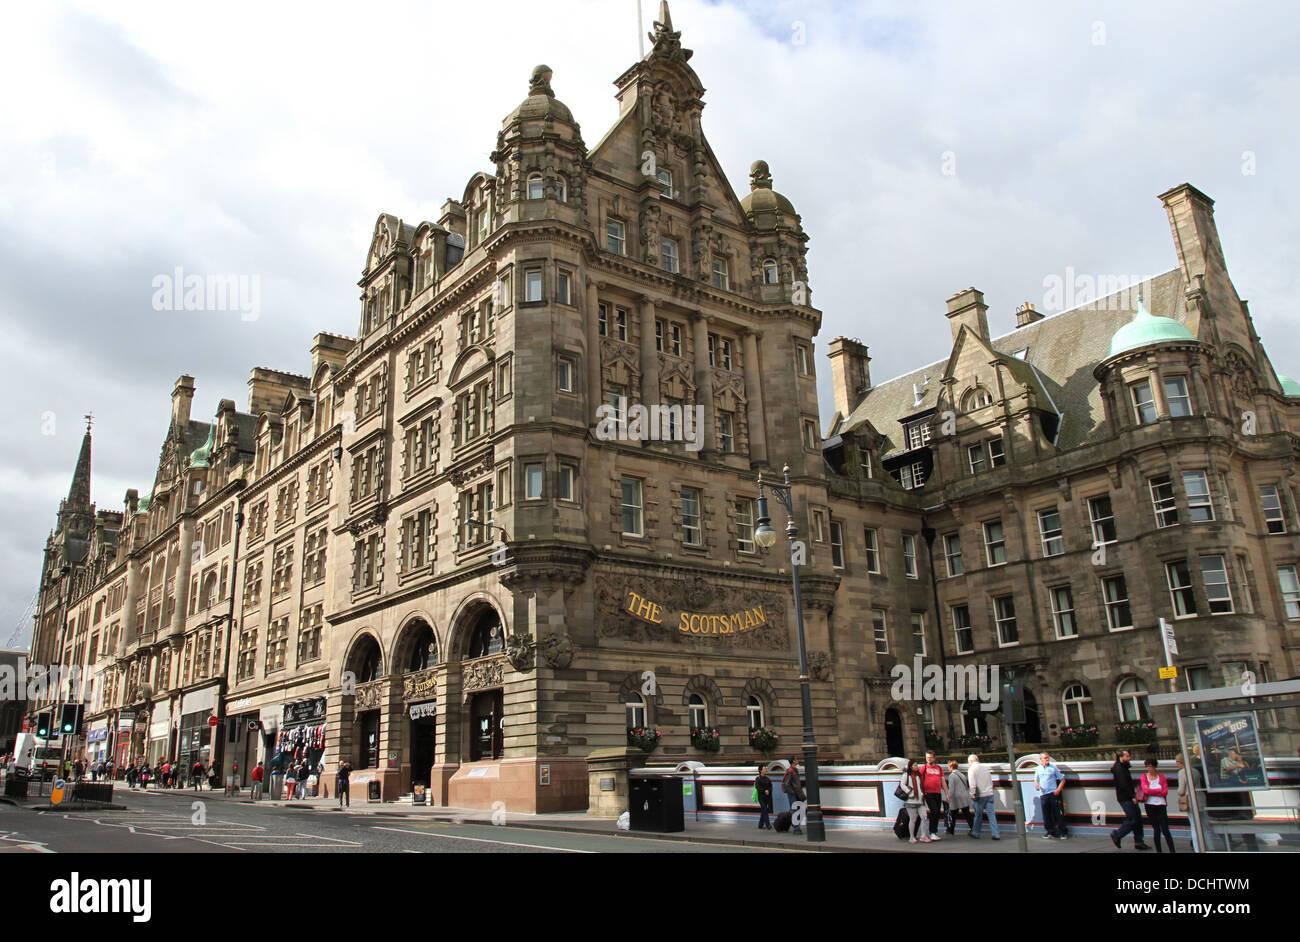 Edinburgh - ITV News